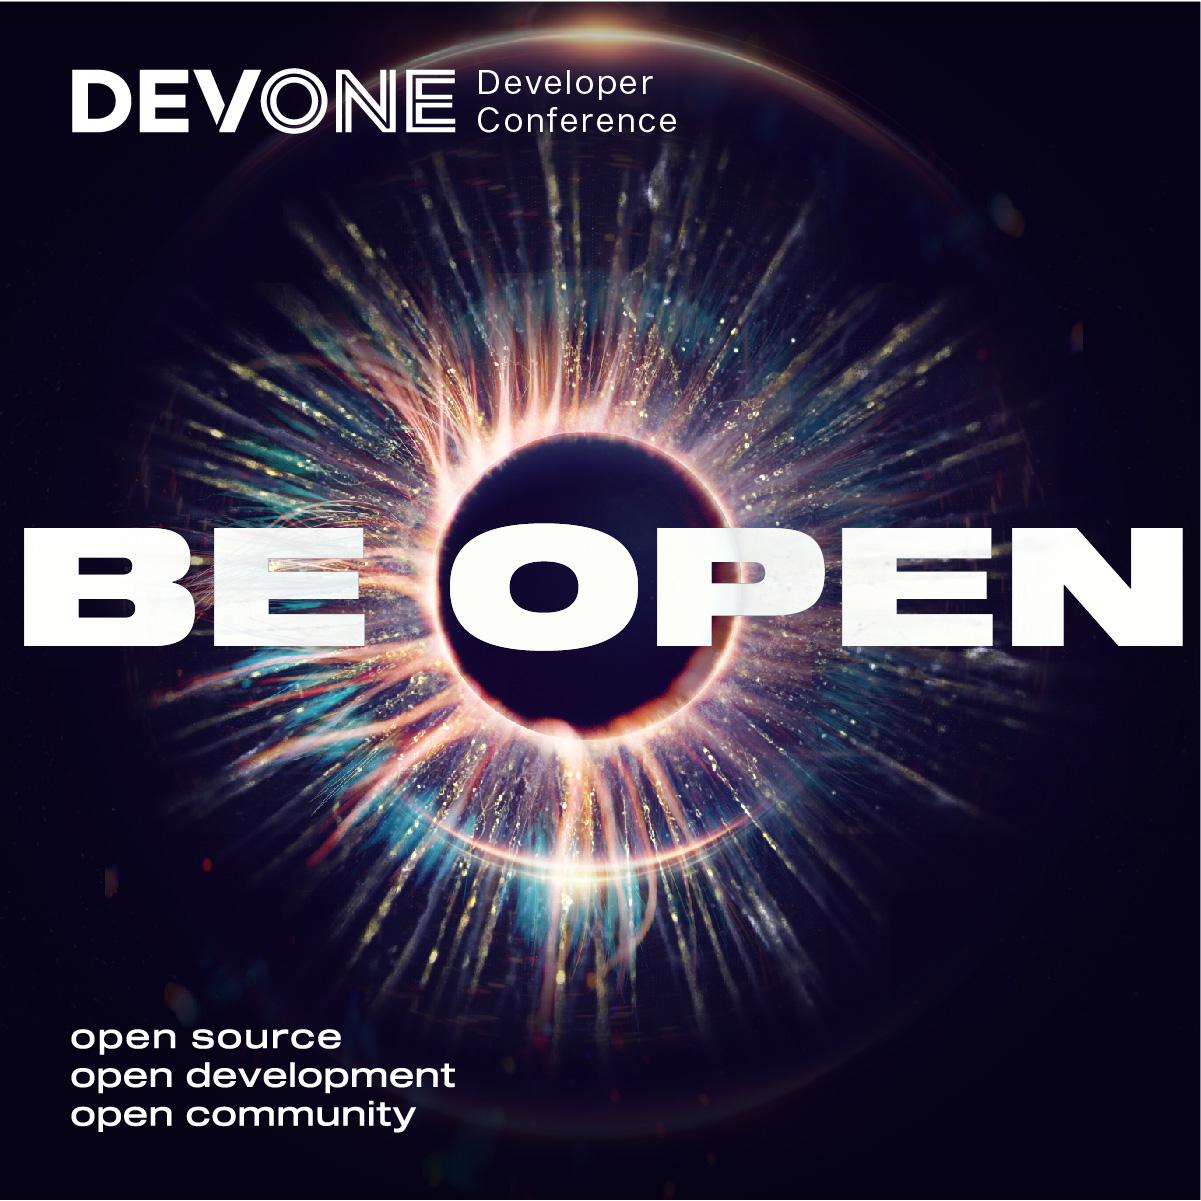 DevOne Conference